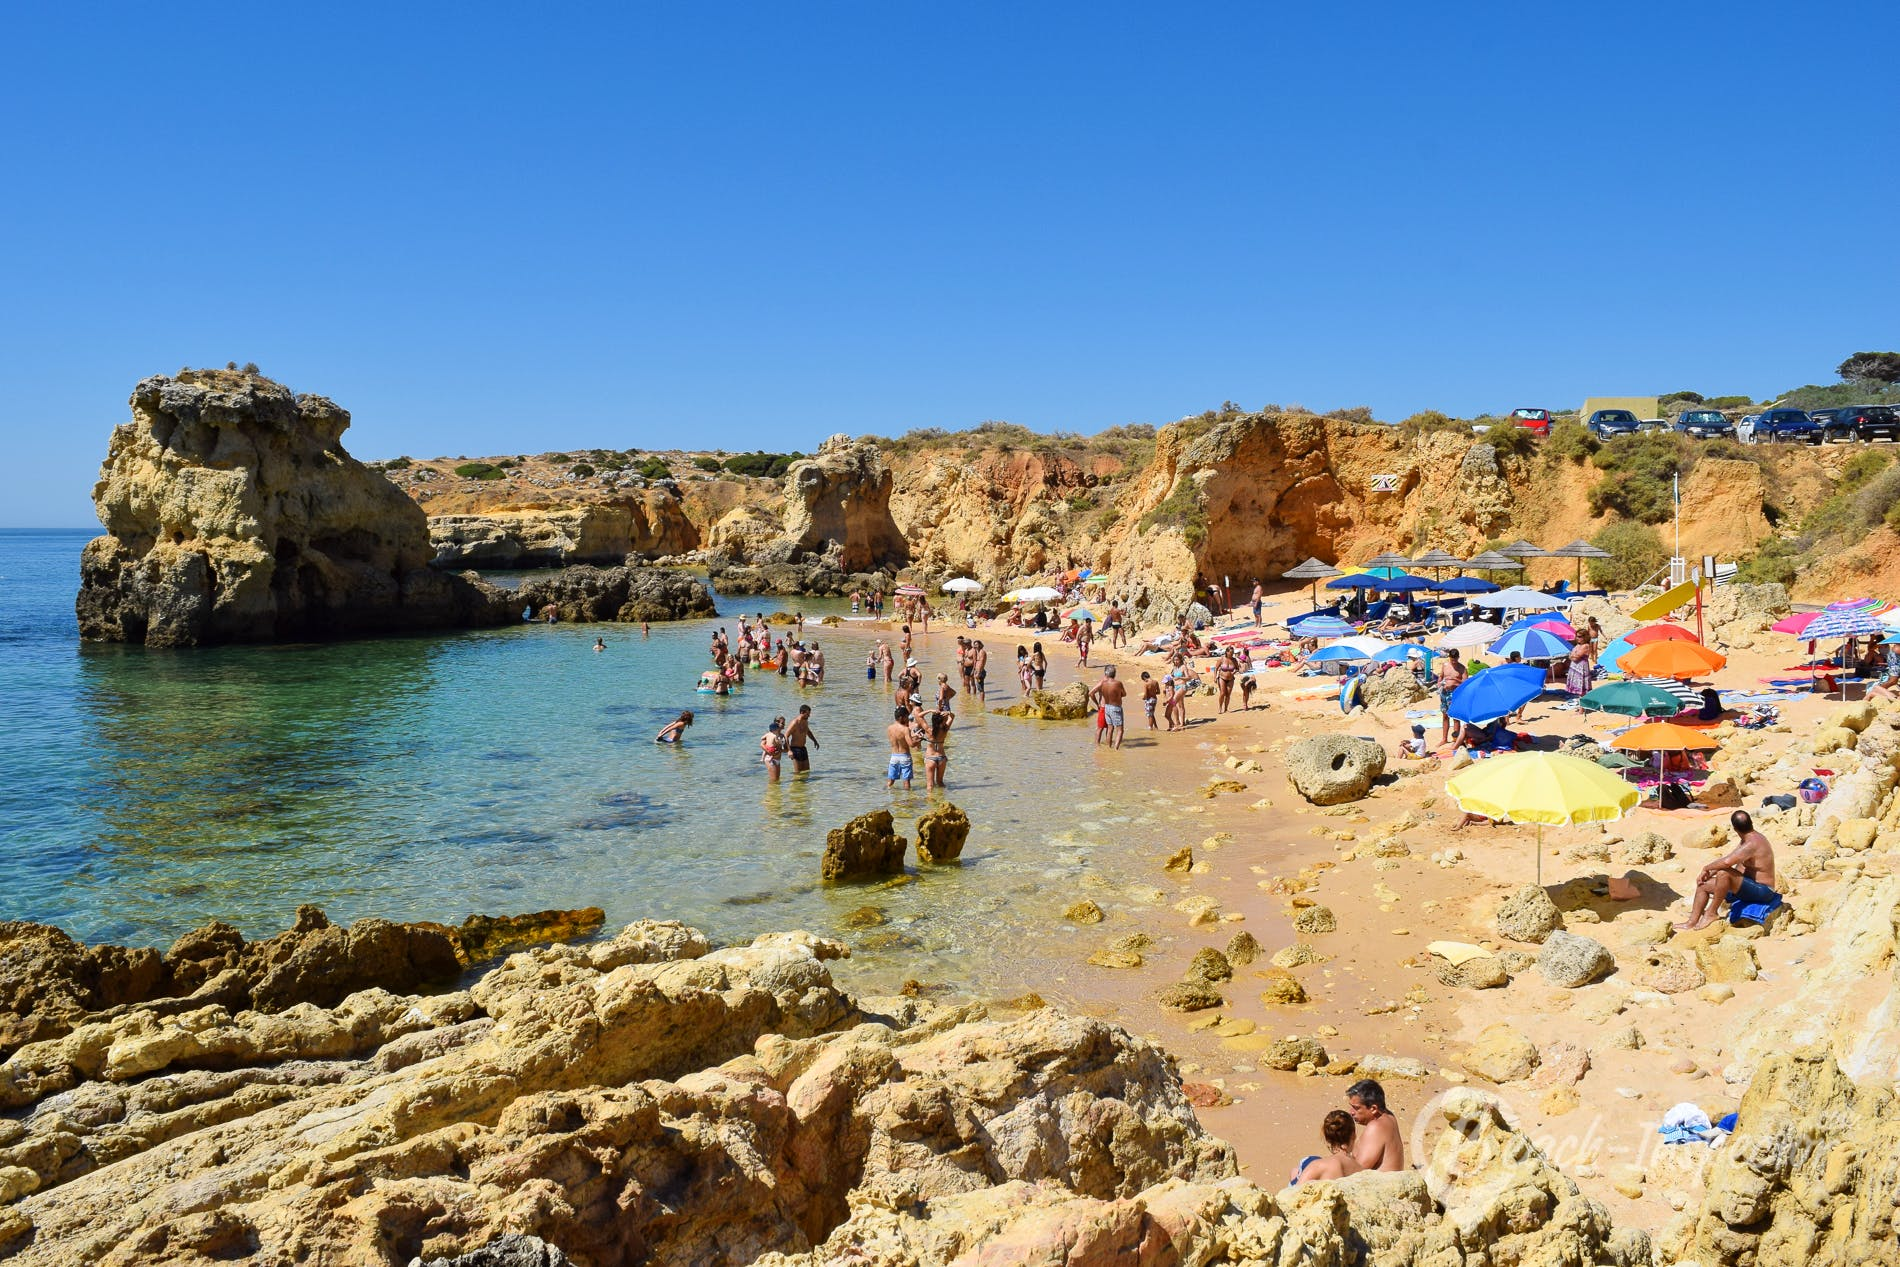 Strand Praia de Arrifes, Algarve, Portugal